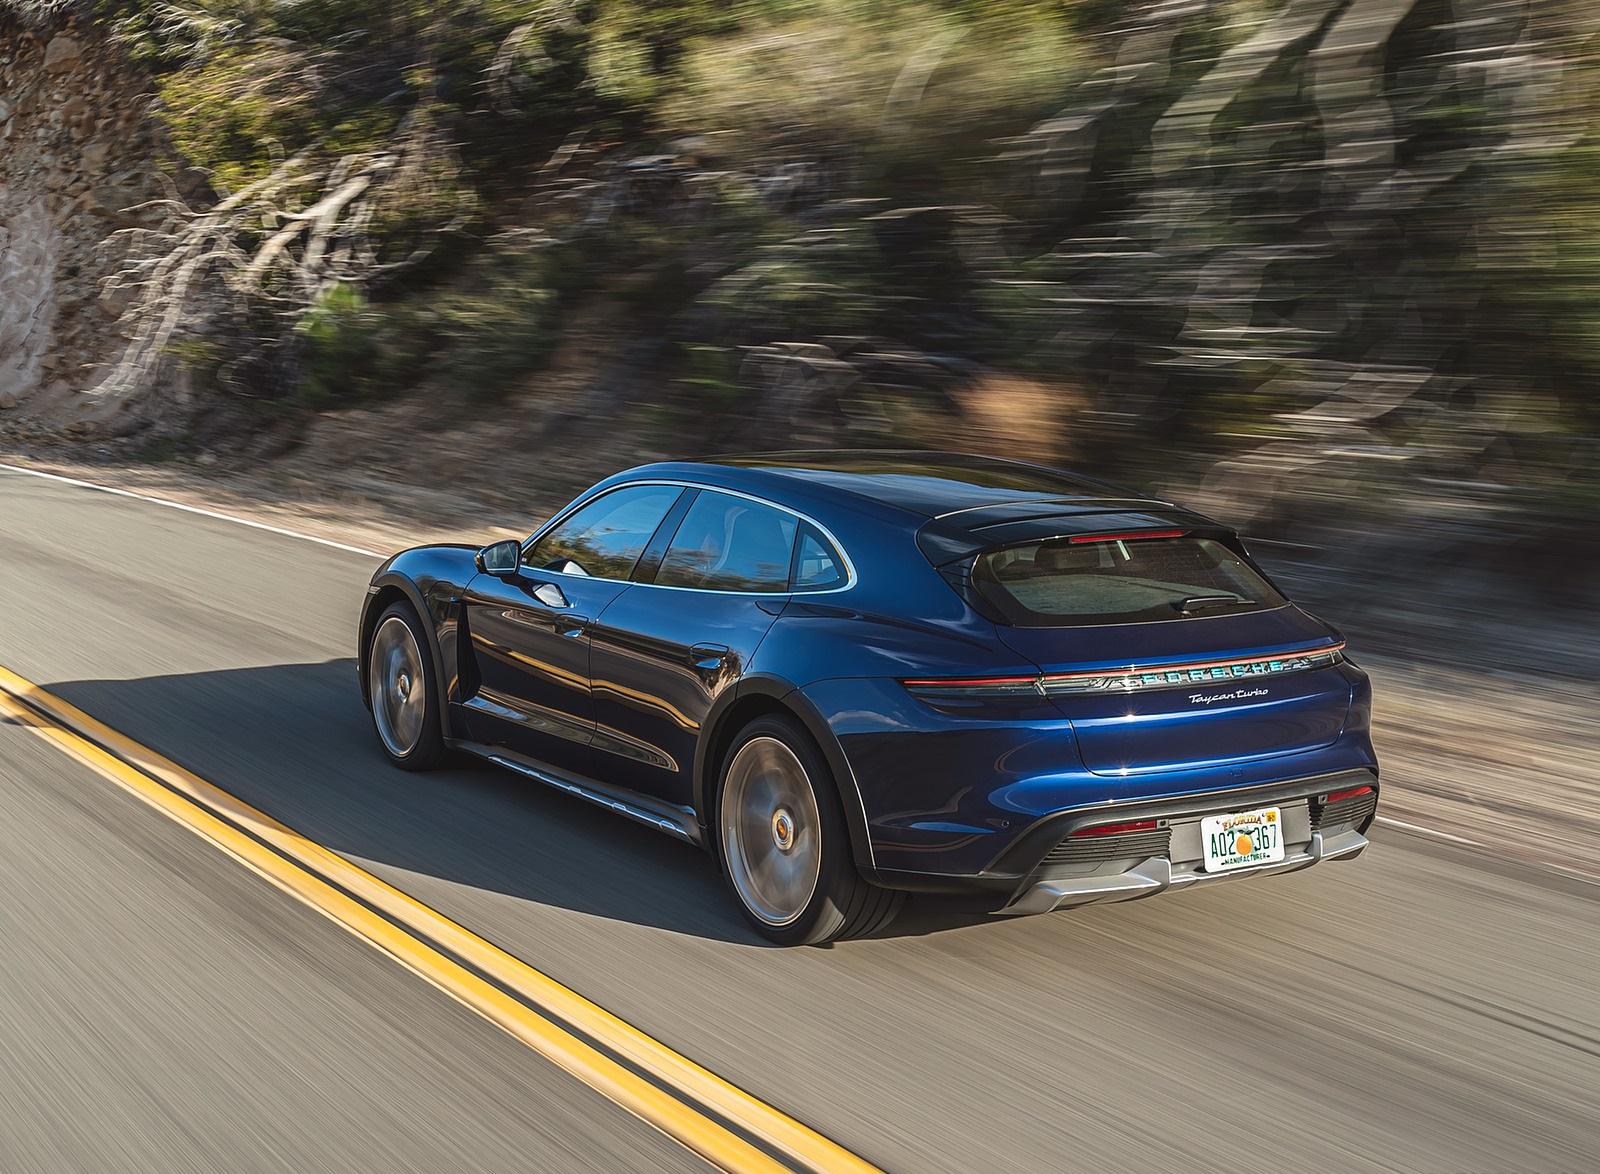 2022 Porsche Taycan Turbo Cross Turismo (Color: Gentian Blue) Rear Three-Quarter Wallpapers (9)